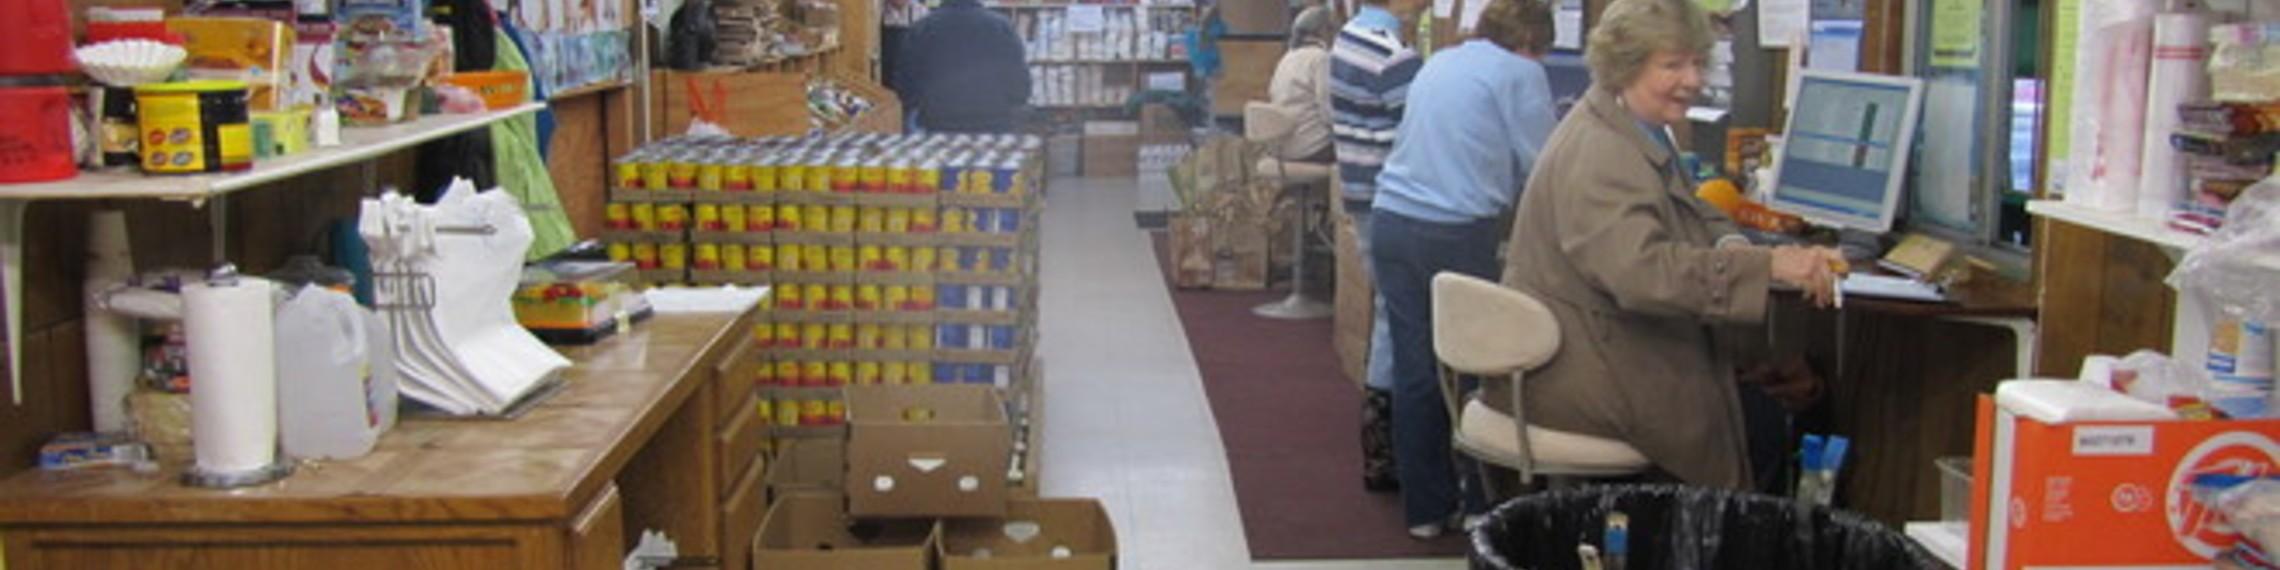 Cordova Community Food Locker